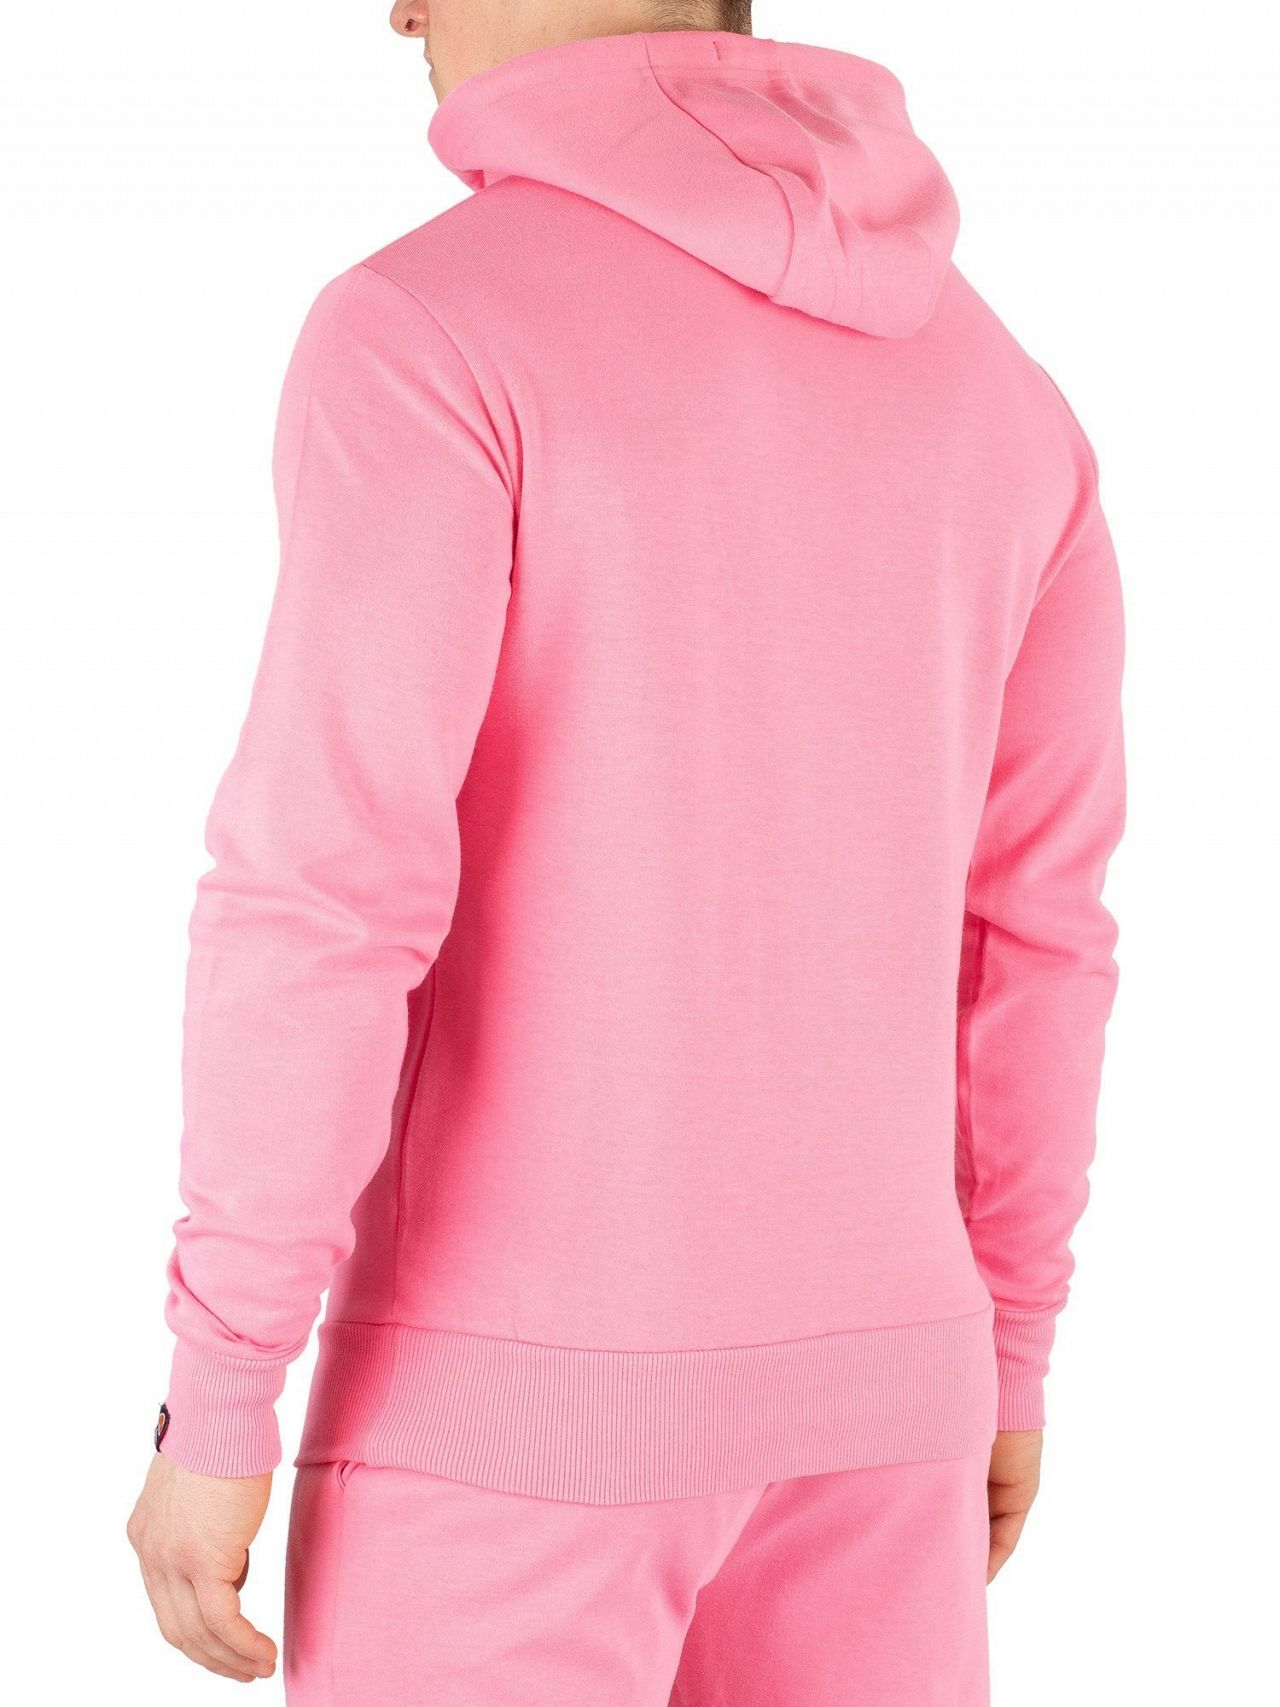 98cbba02 Ellesse Pink Runaway Pullover Hoodie | Standout